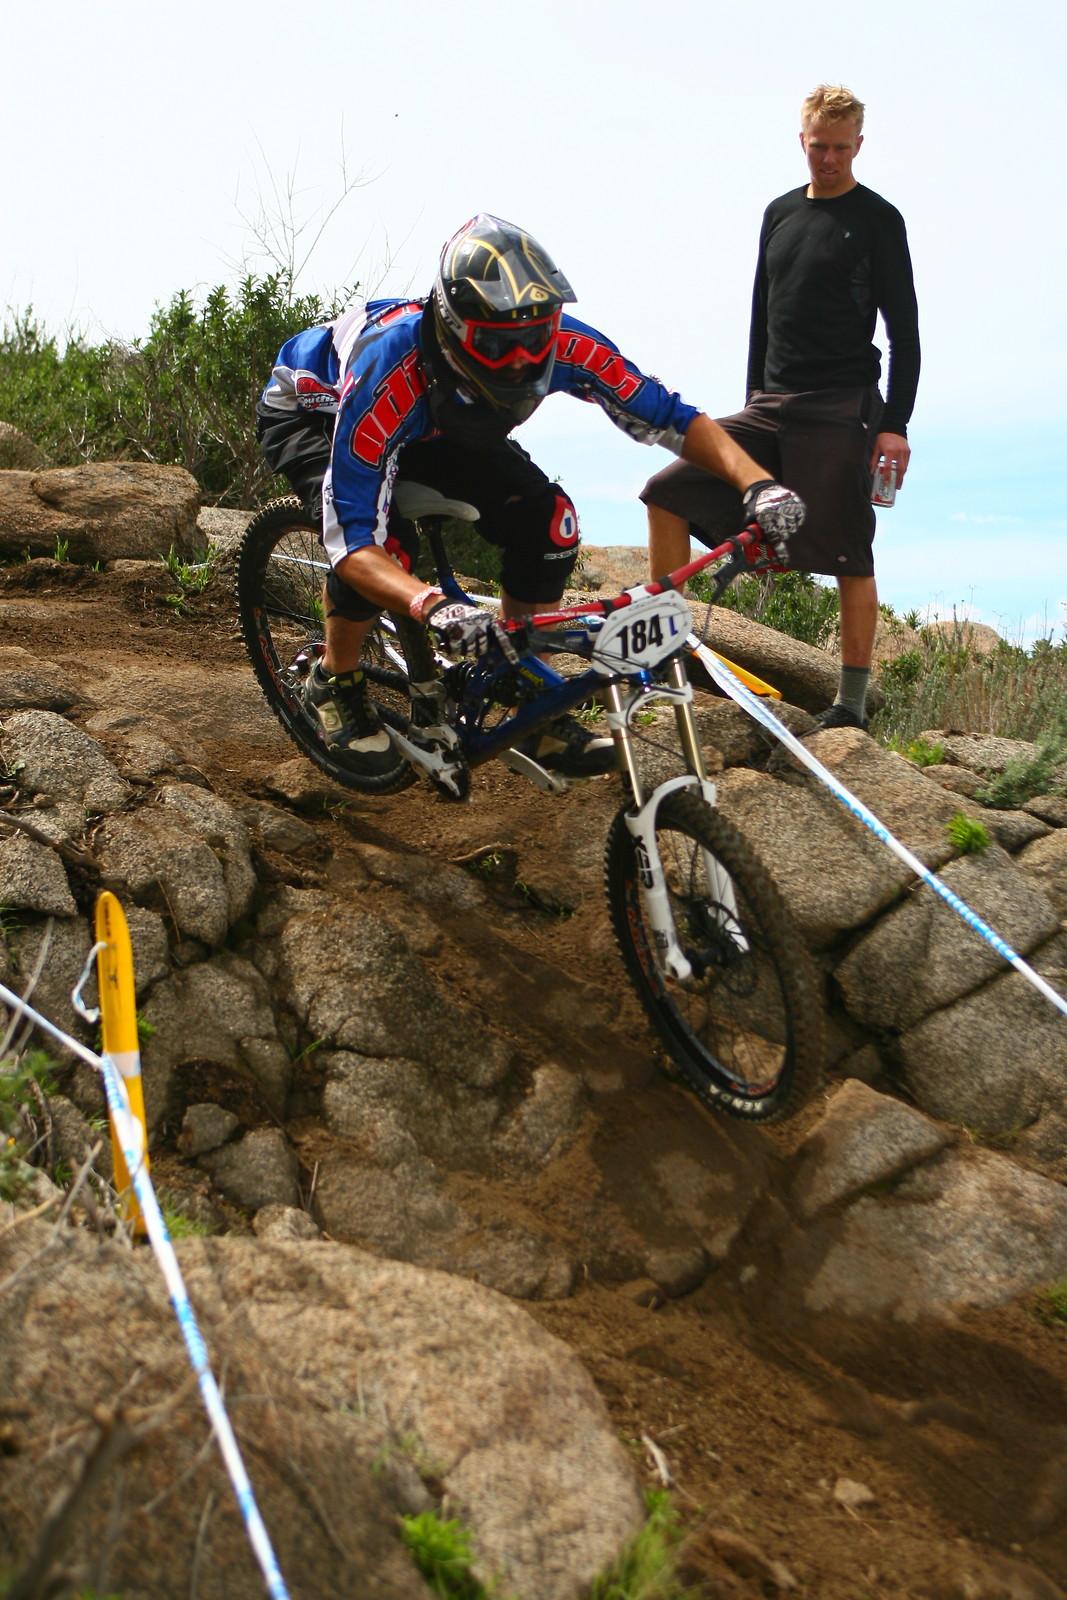 photo_18903_20100308 - Dereka15 - Mountain Biking Pictures - Vital MTB